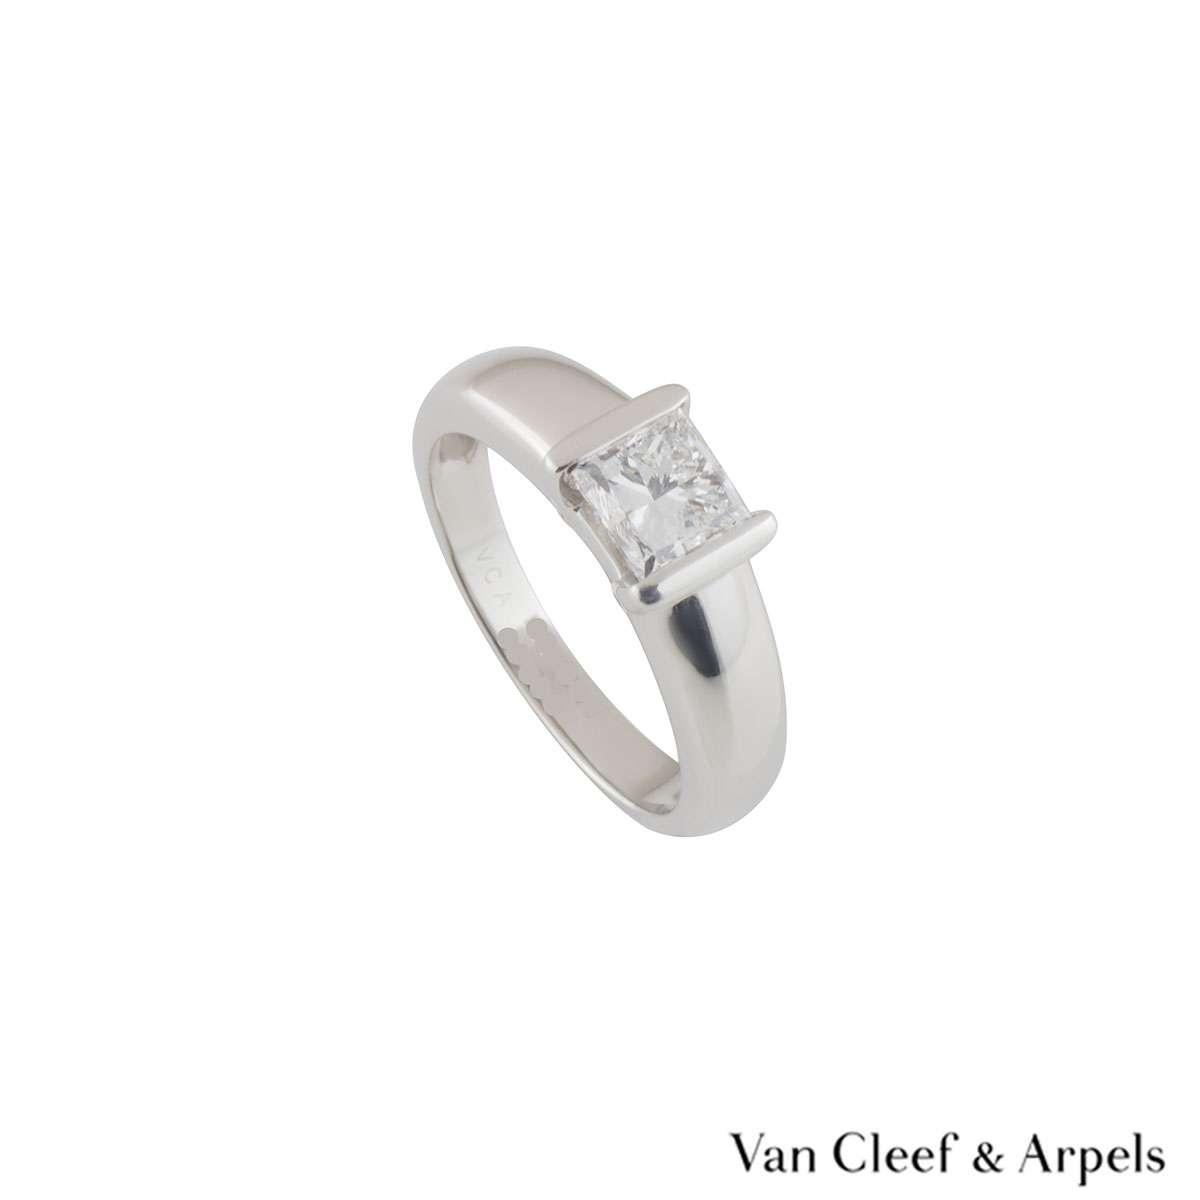 Van Cleef & Arpels White Gold Diamond Ring 1.01ct E/VVS1